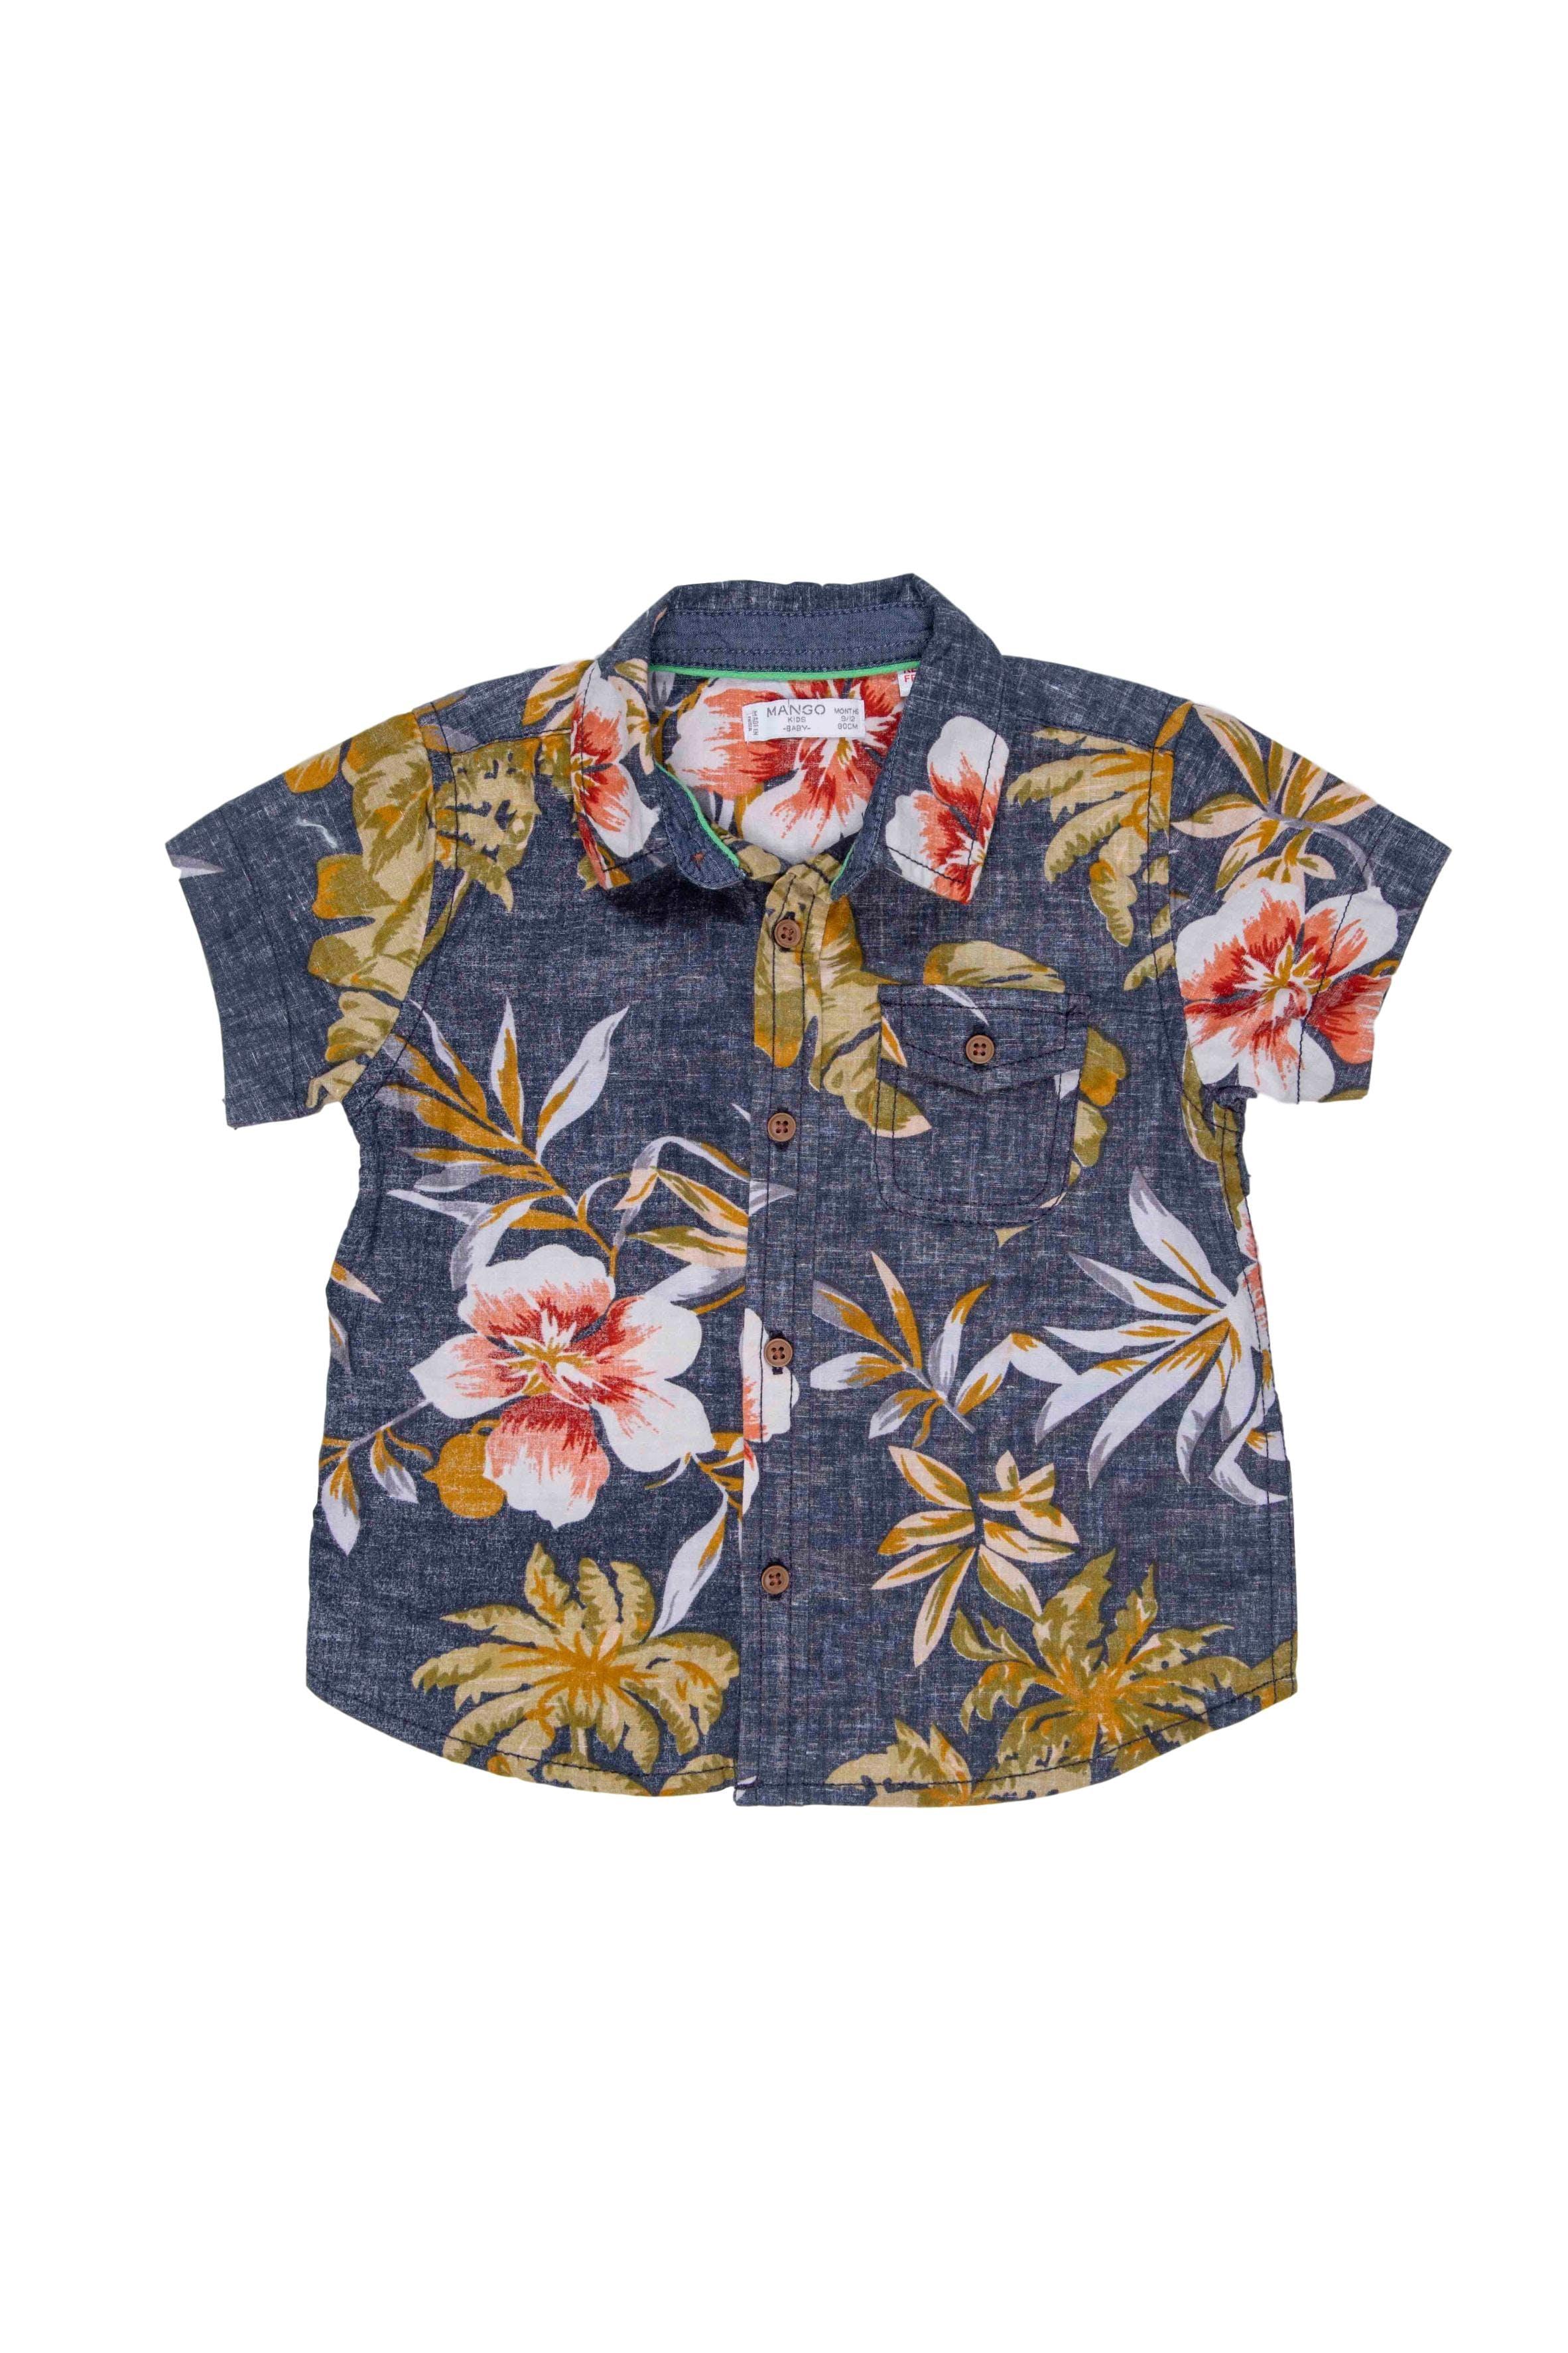 Camisa floreada manga corta, 100% algodón, con bolsillo - Mango